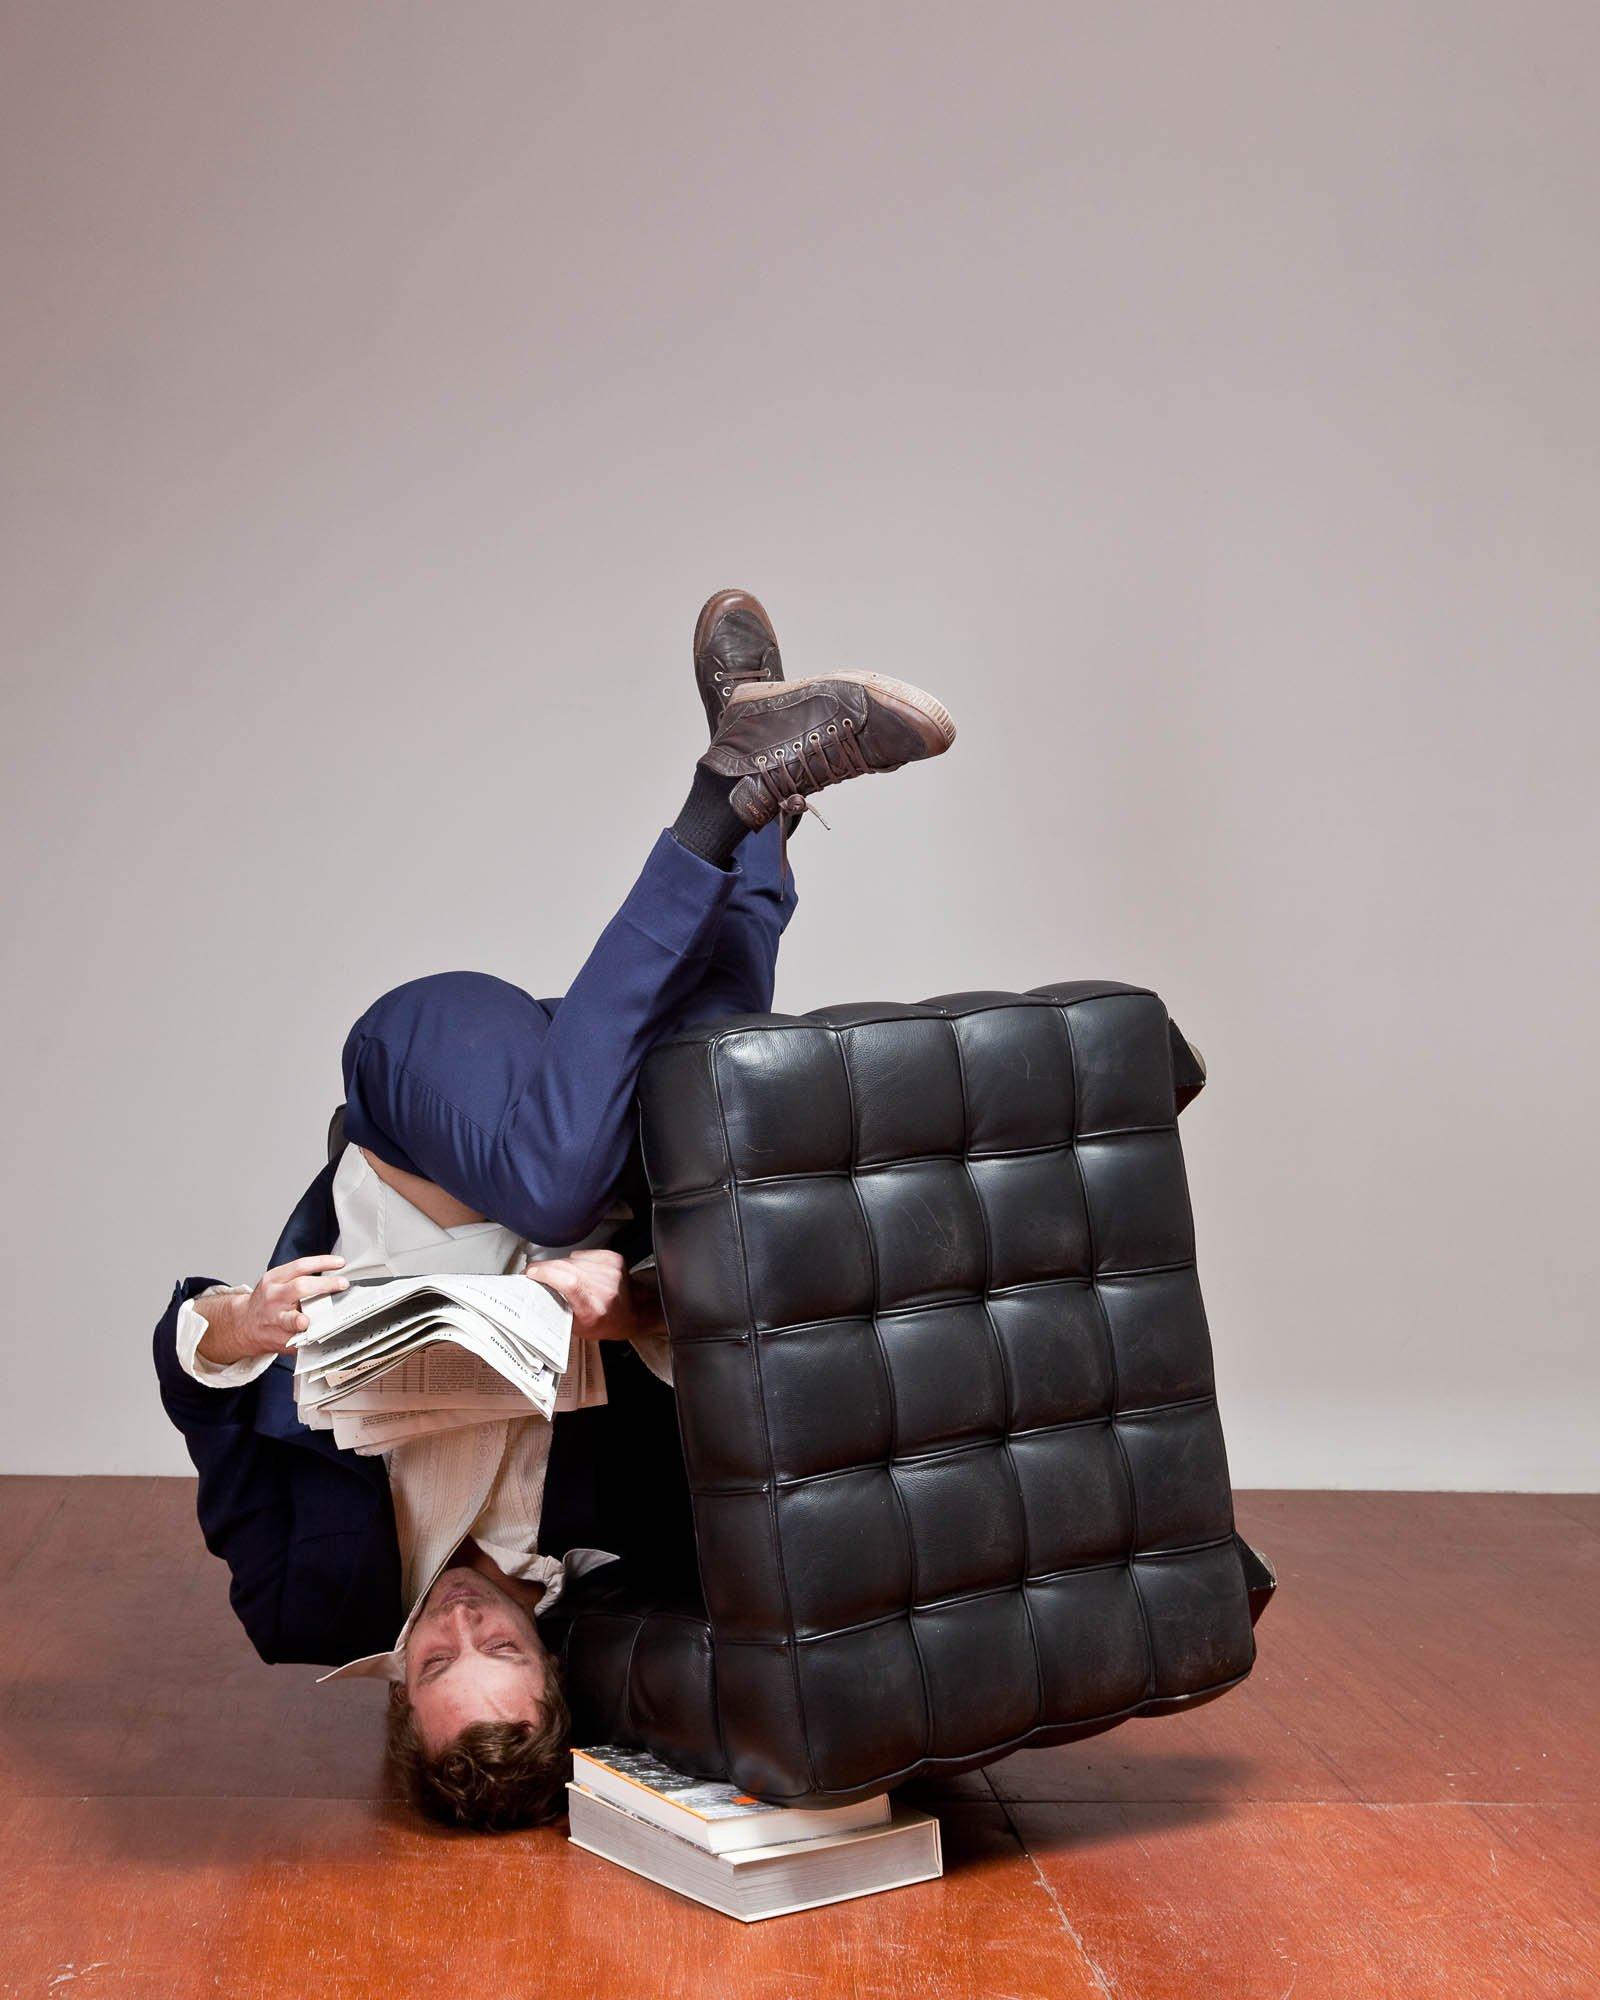 Seeking comfort in an uncomfortable chair. Photo Kristof Vrancken, performer Seppe Baeyens. Courtesy Z33, Hasselt